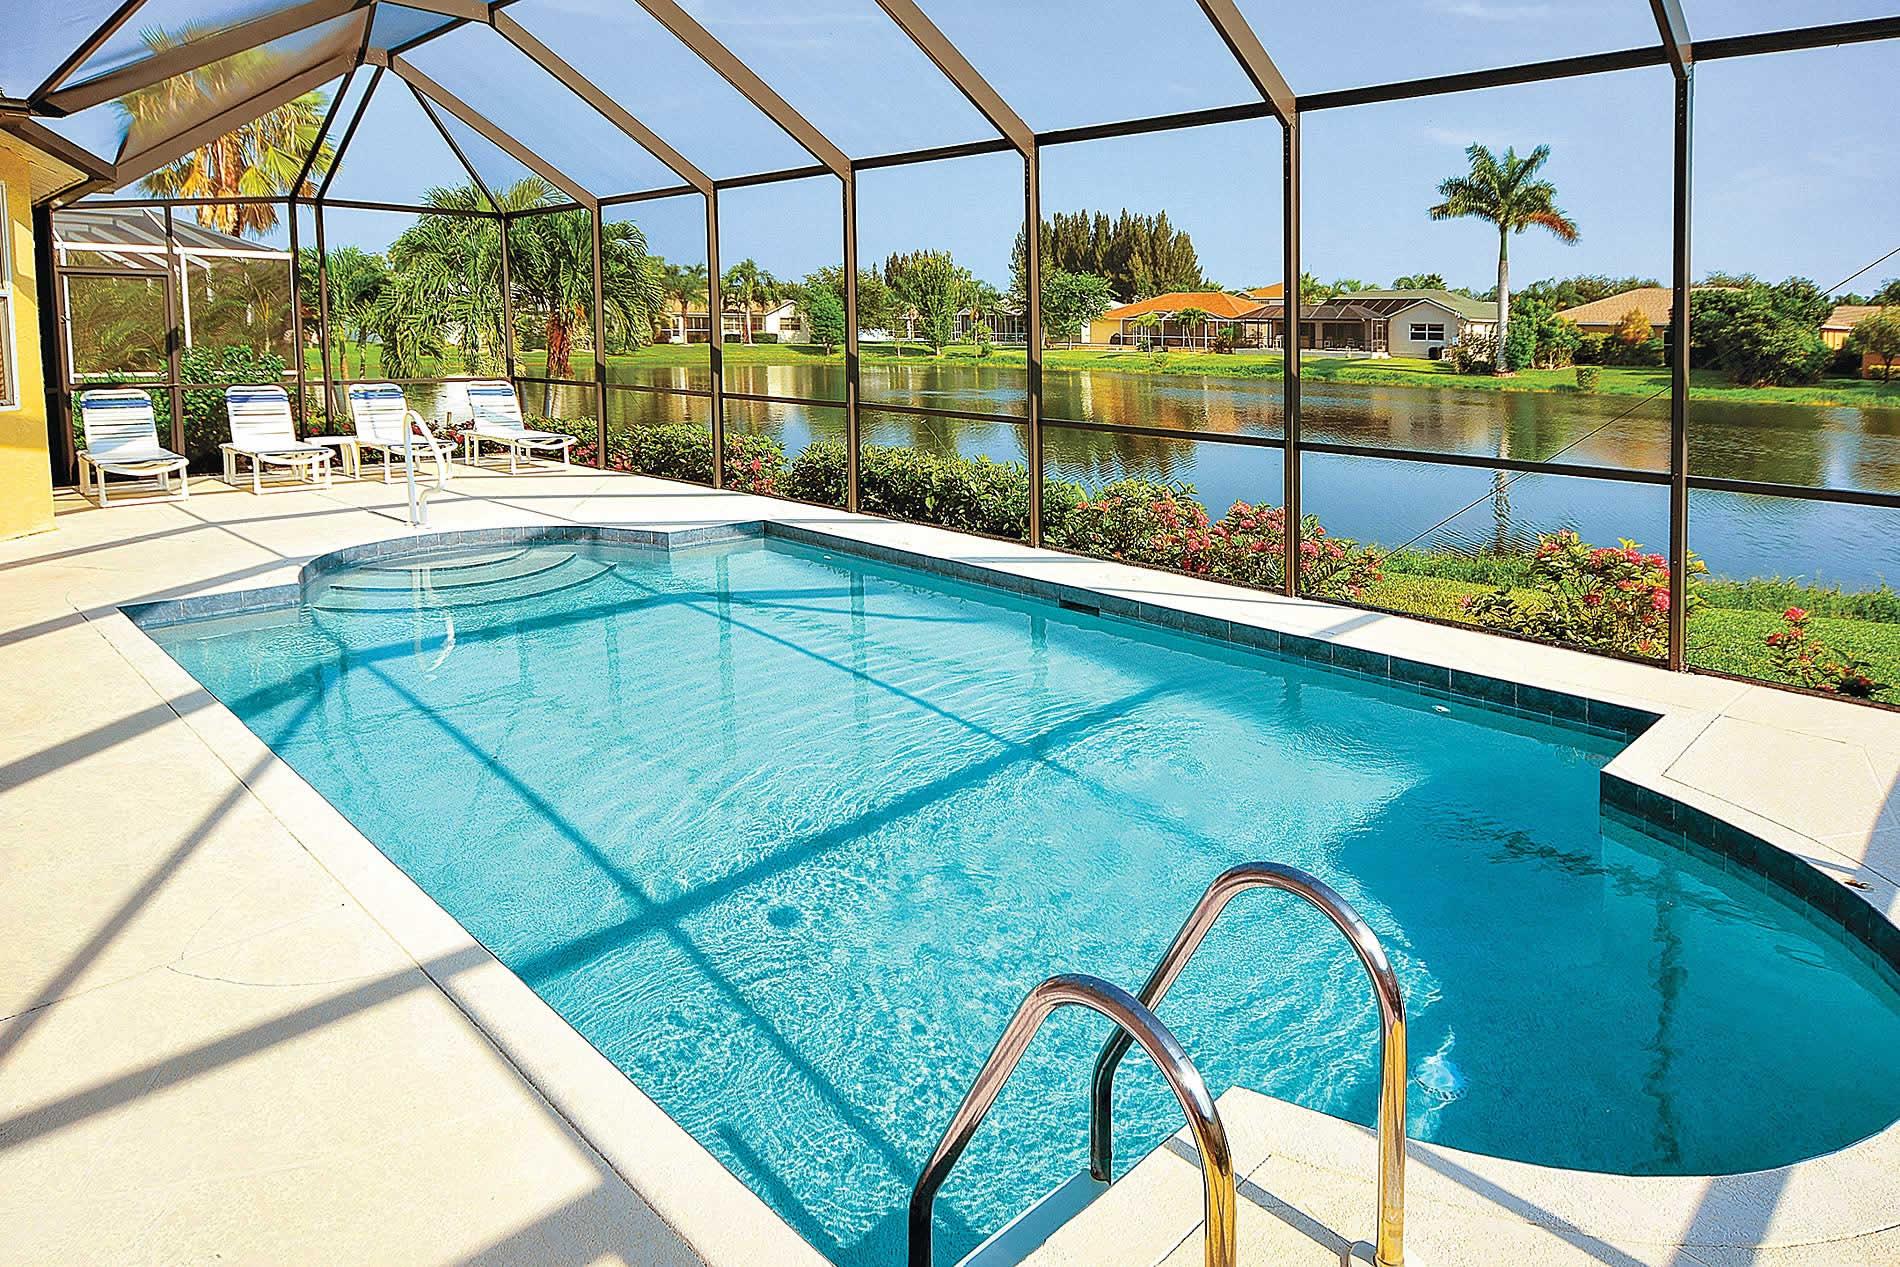 Villa White Ibis in Fort Myers - sleeps 6 people